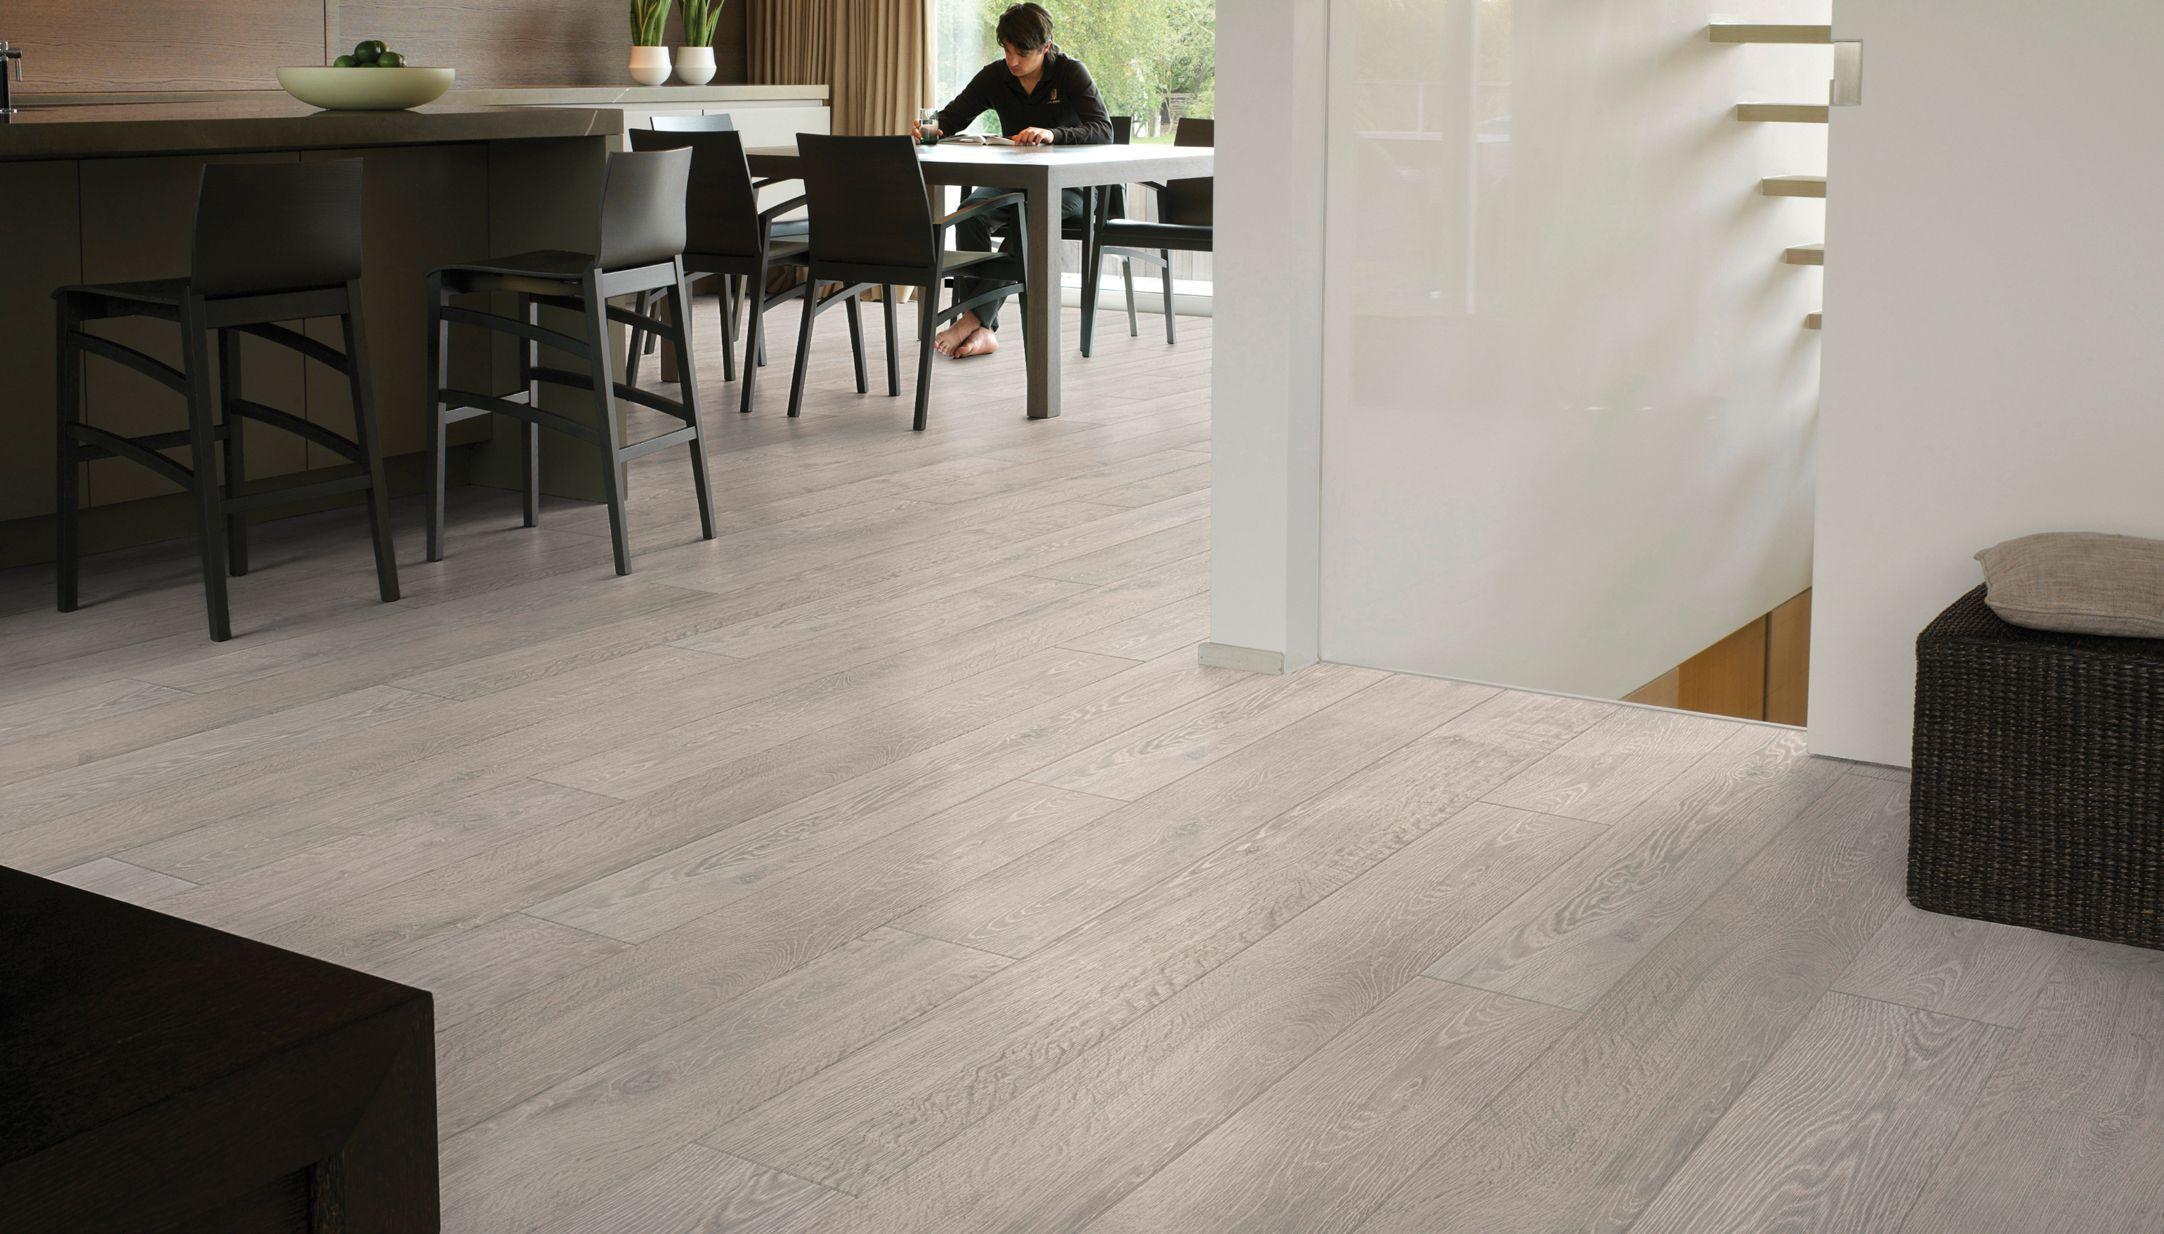 plank pack prd departments santander princeps effect q laminate floors diy wide bq b oak at flooring m